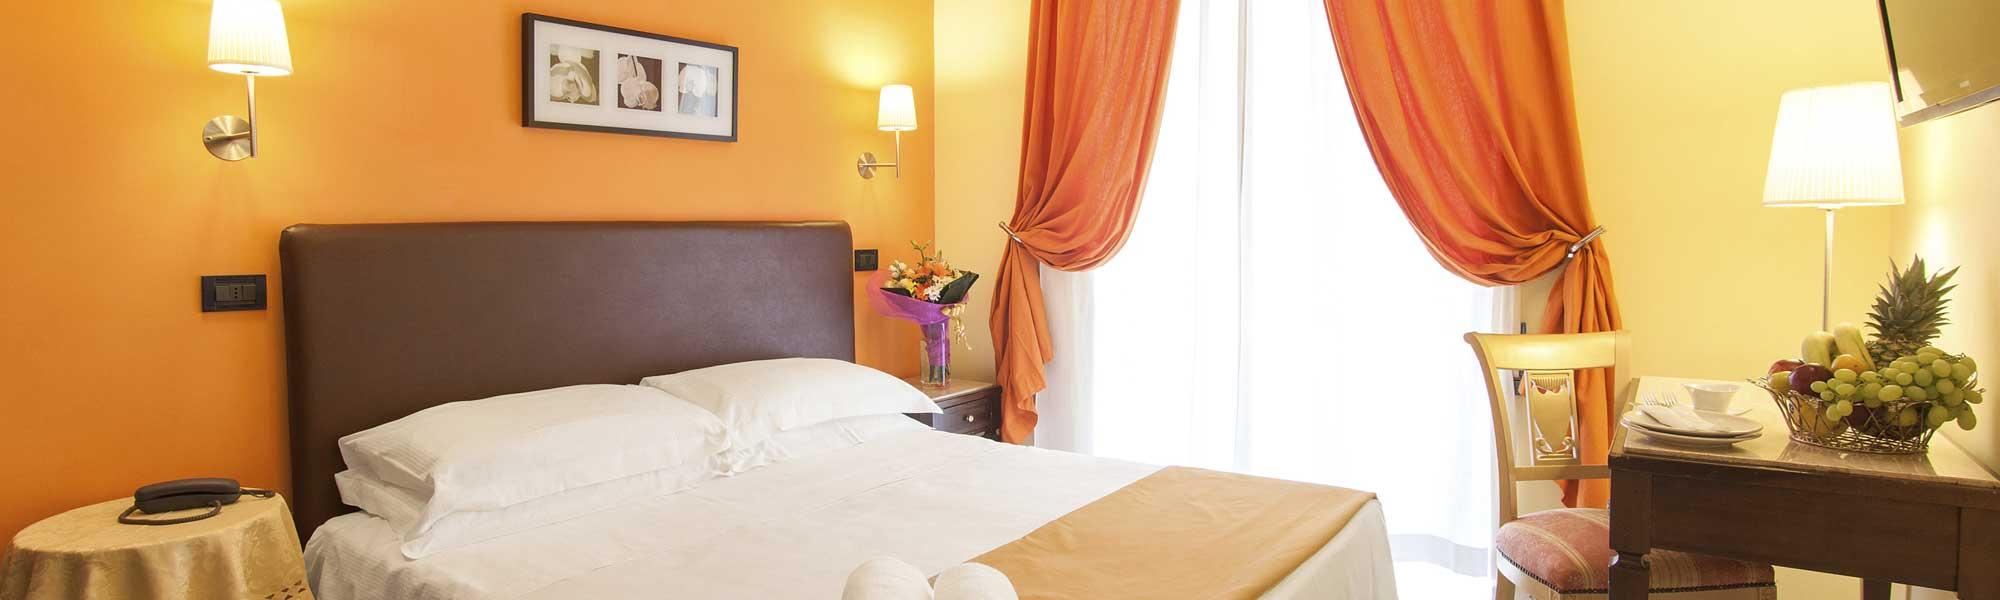 Matrimoniale.Standard Double Room High Quality Breakfast 3 Stars Hotel Rome Center